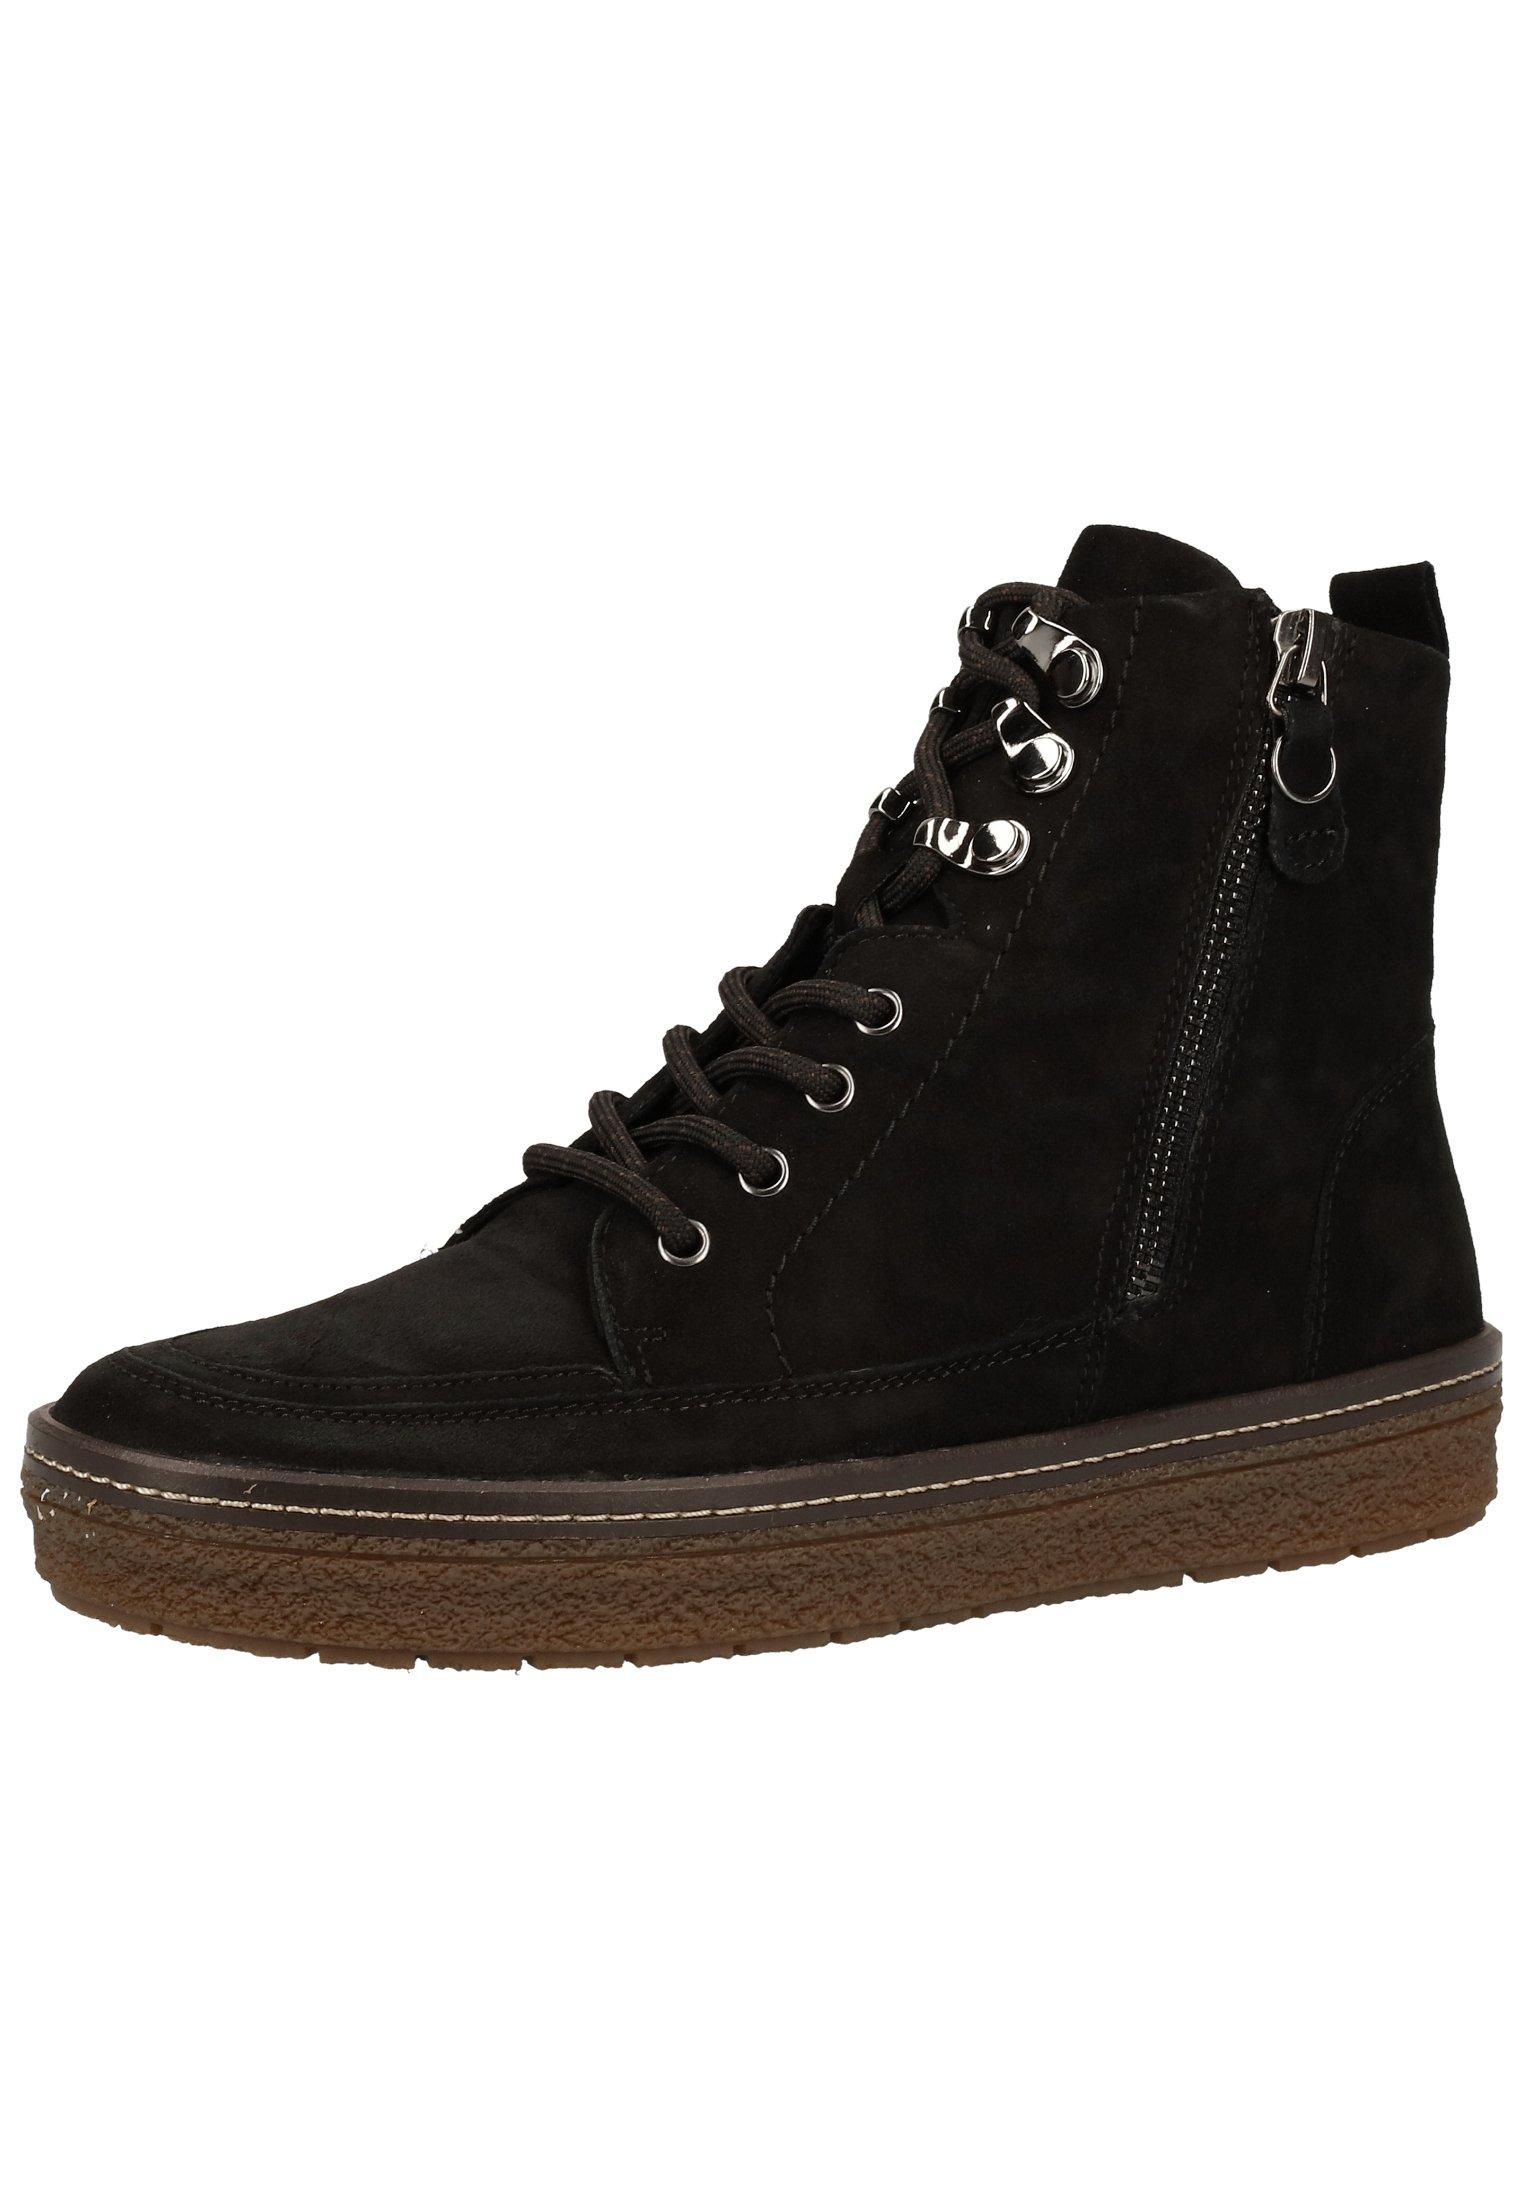 Caprice Ankle Boot black suede 004/schwarz